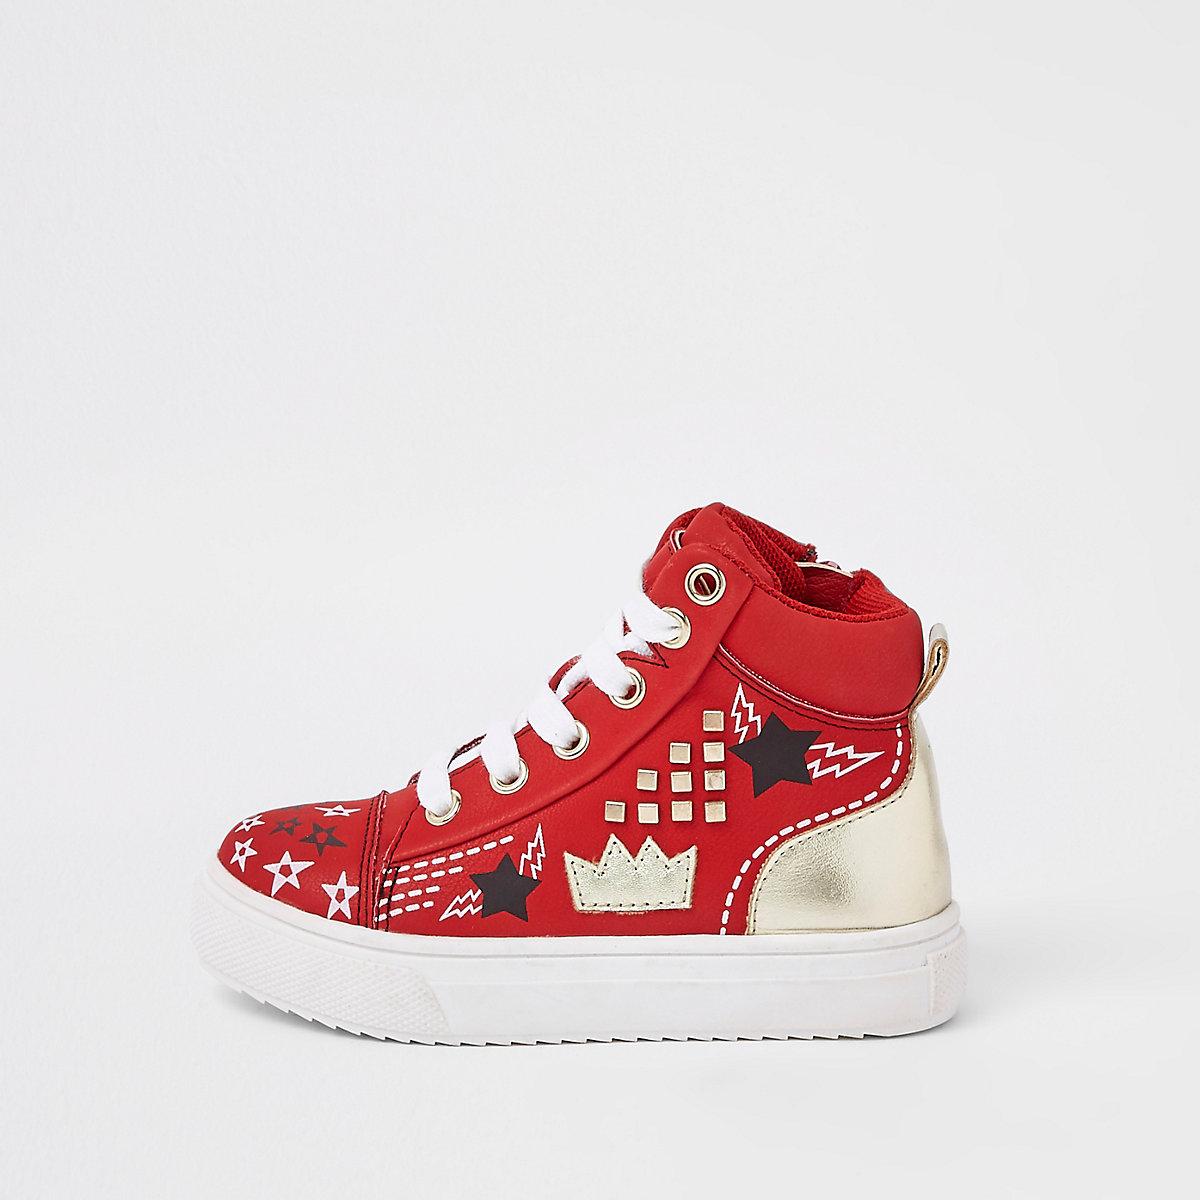 Mini kids red customized high top sneakers